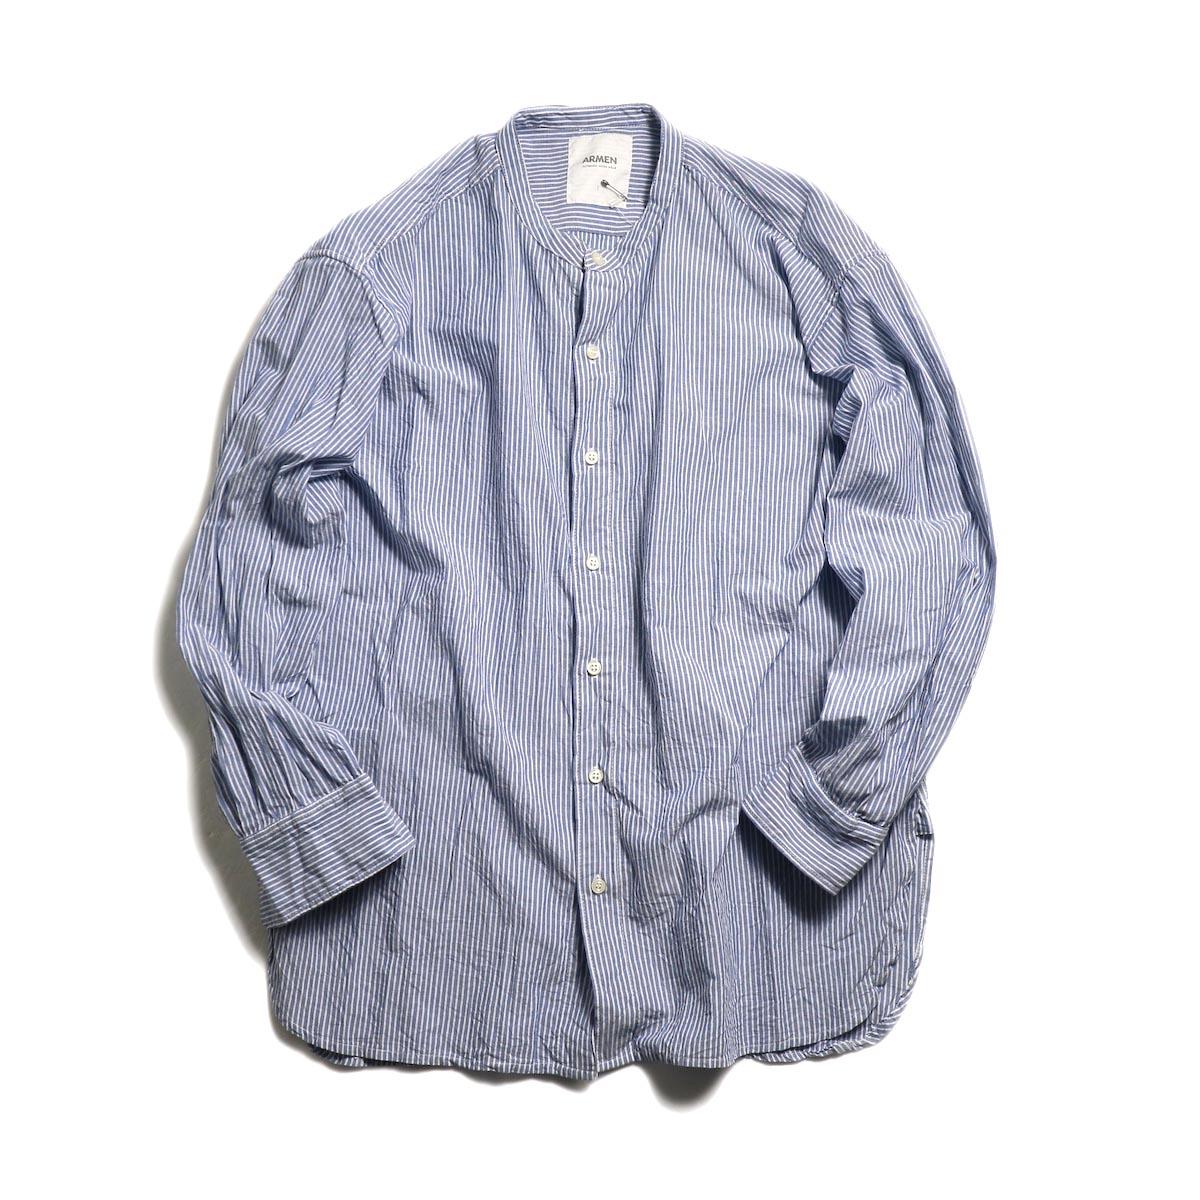 ARMEN / Utility Banded Collar Shirt -Blue Stripe